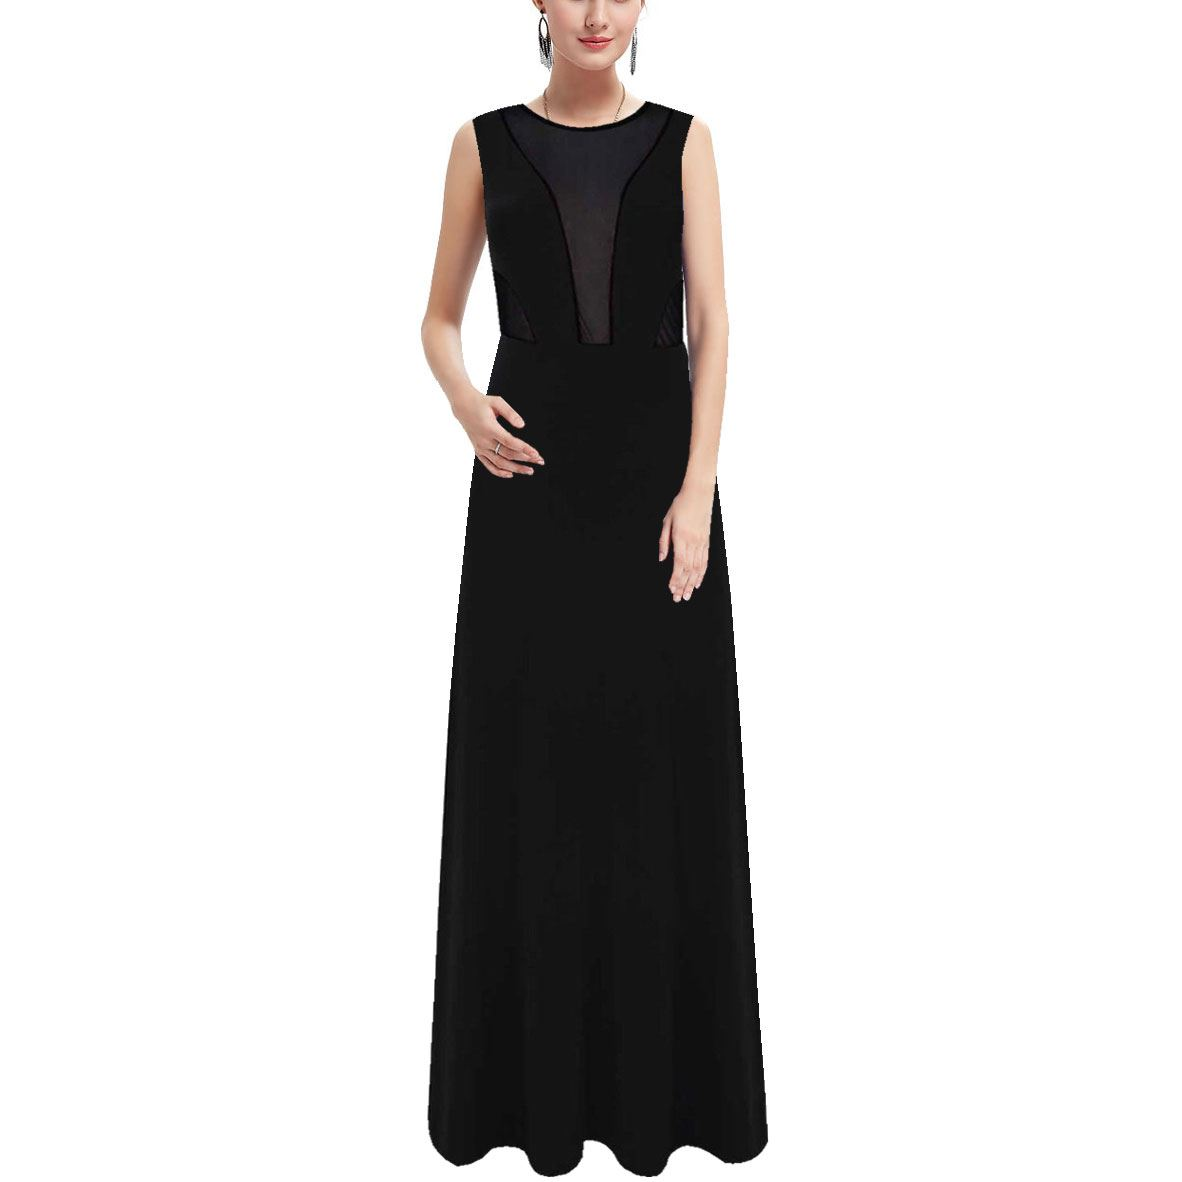 Womens-Ladies-Sheer-Mesh-Insert-Grecian-Long-Maxi-Drape-Prom-Fancy-Dress-Party